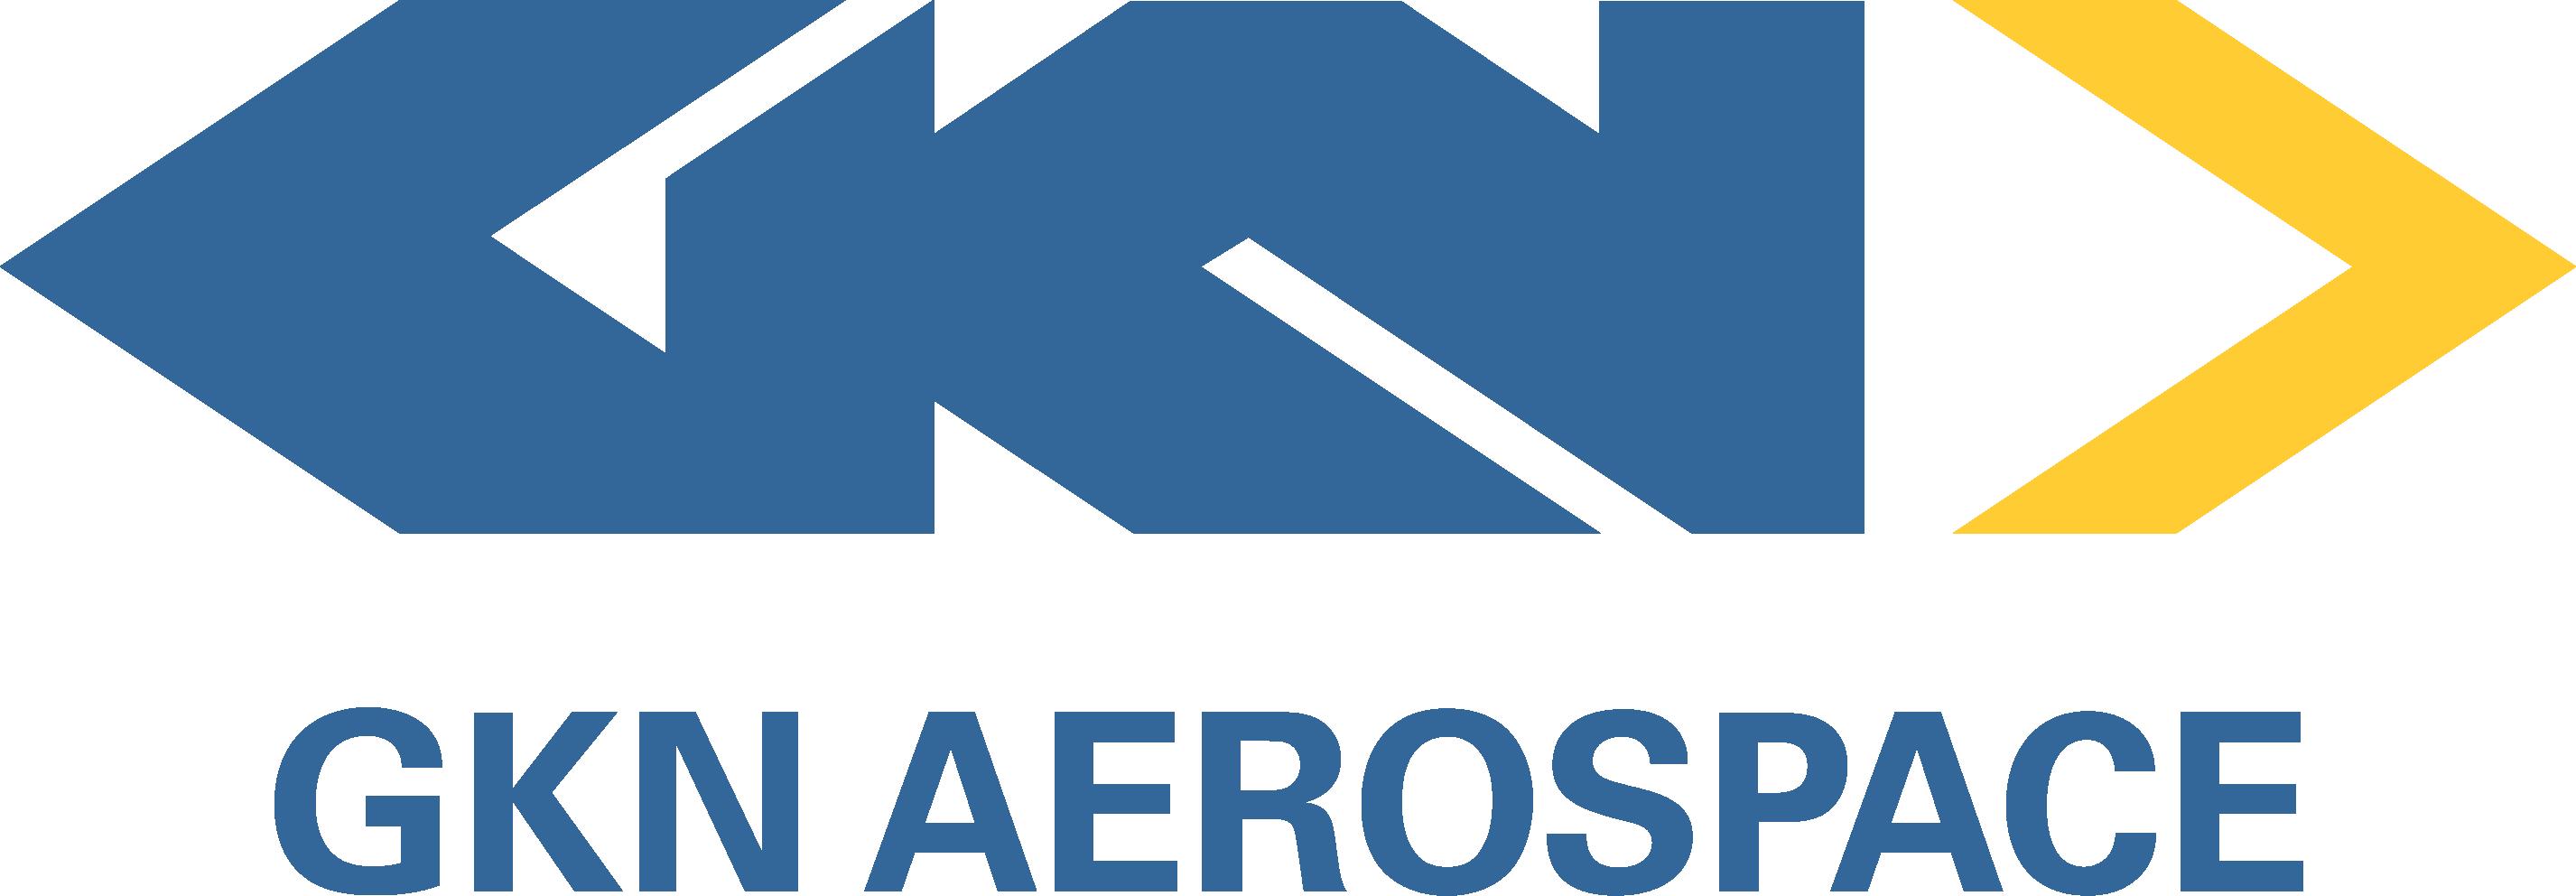 GKN Aerospace Logo WEB-VIDEO